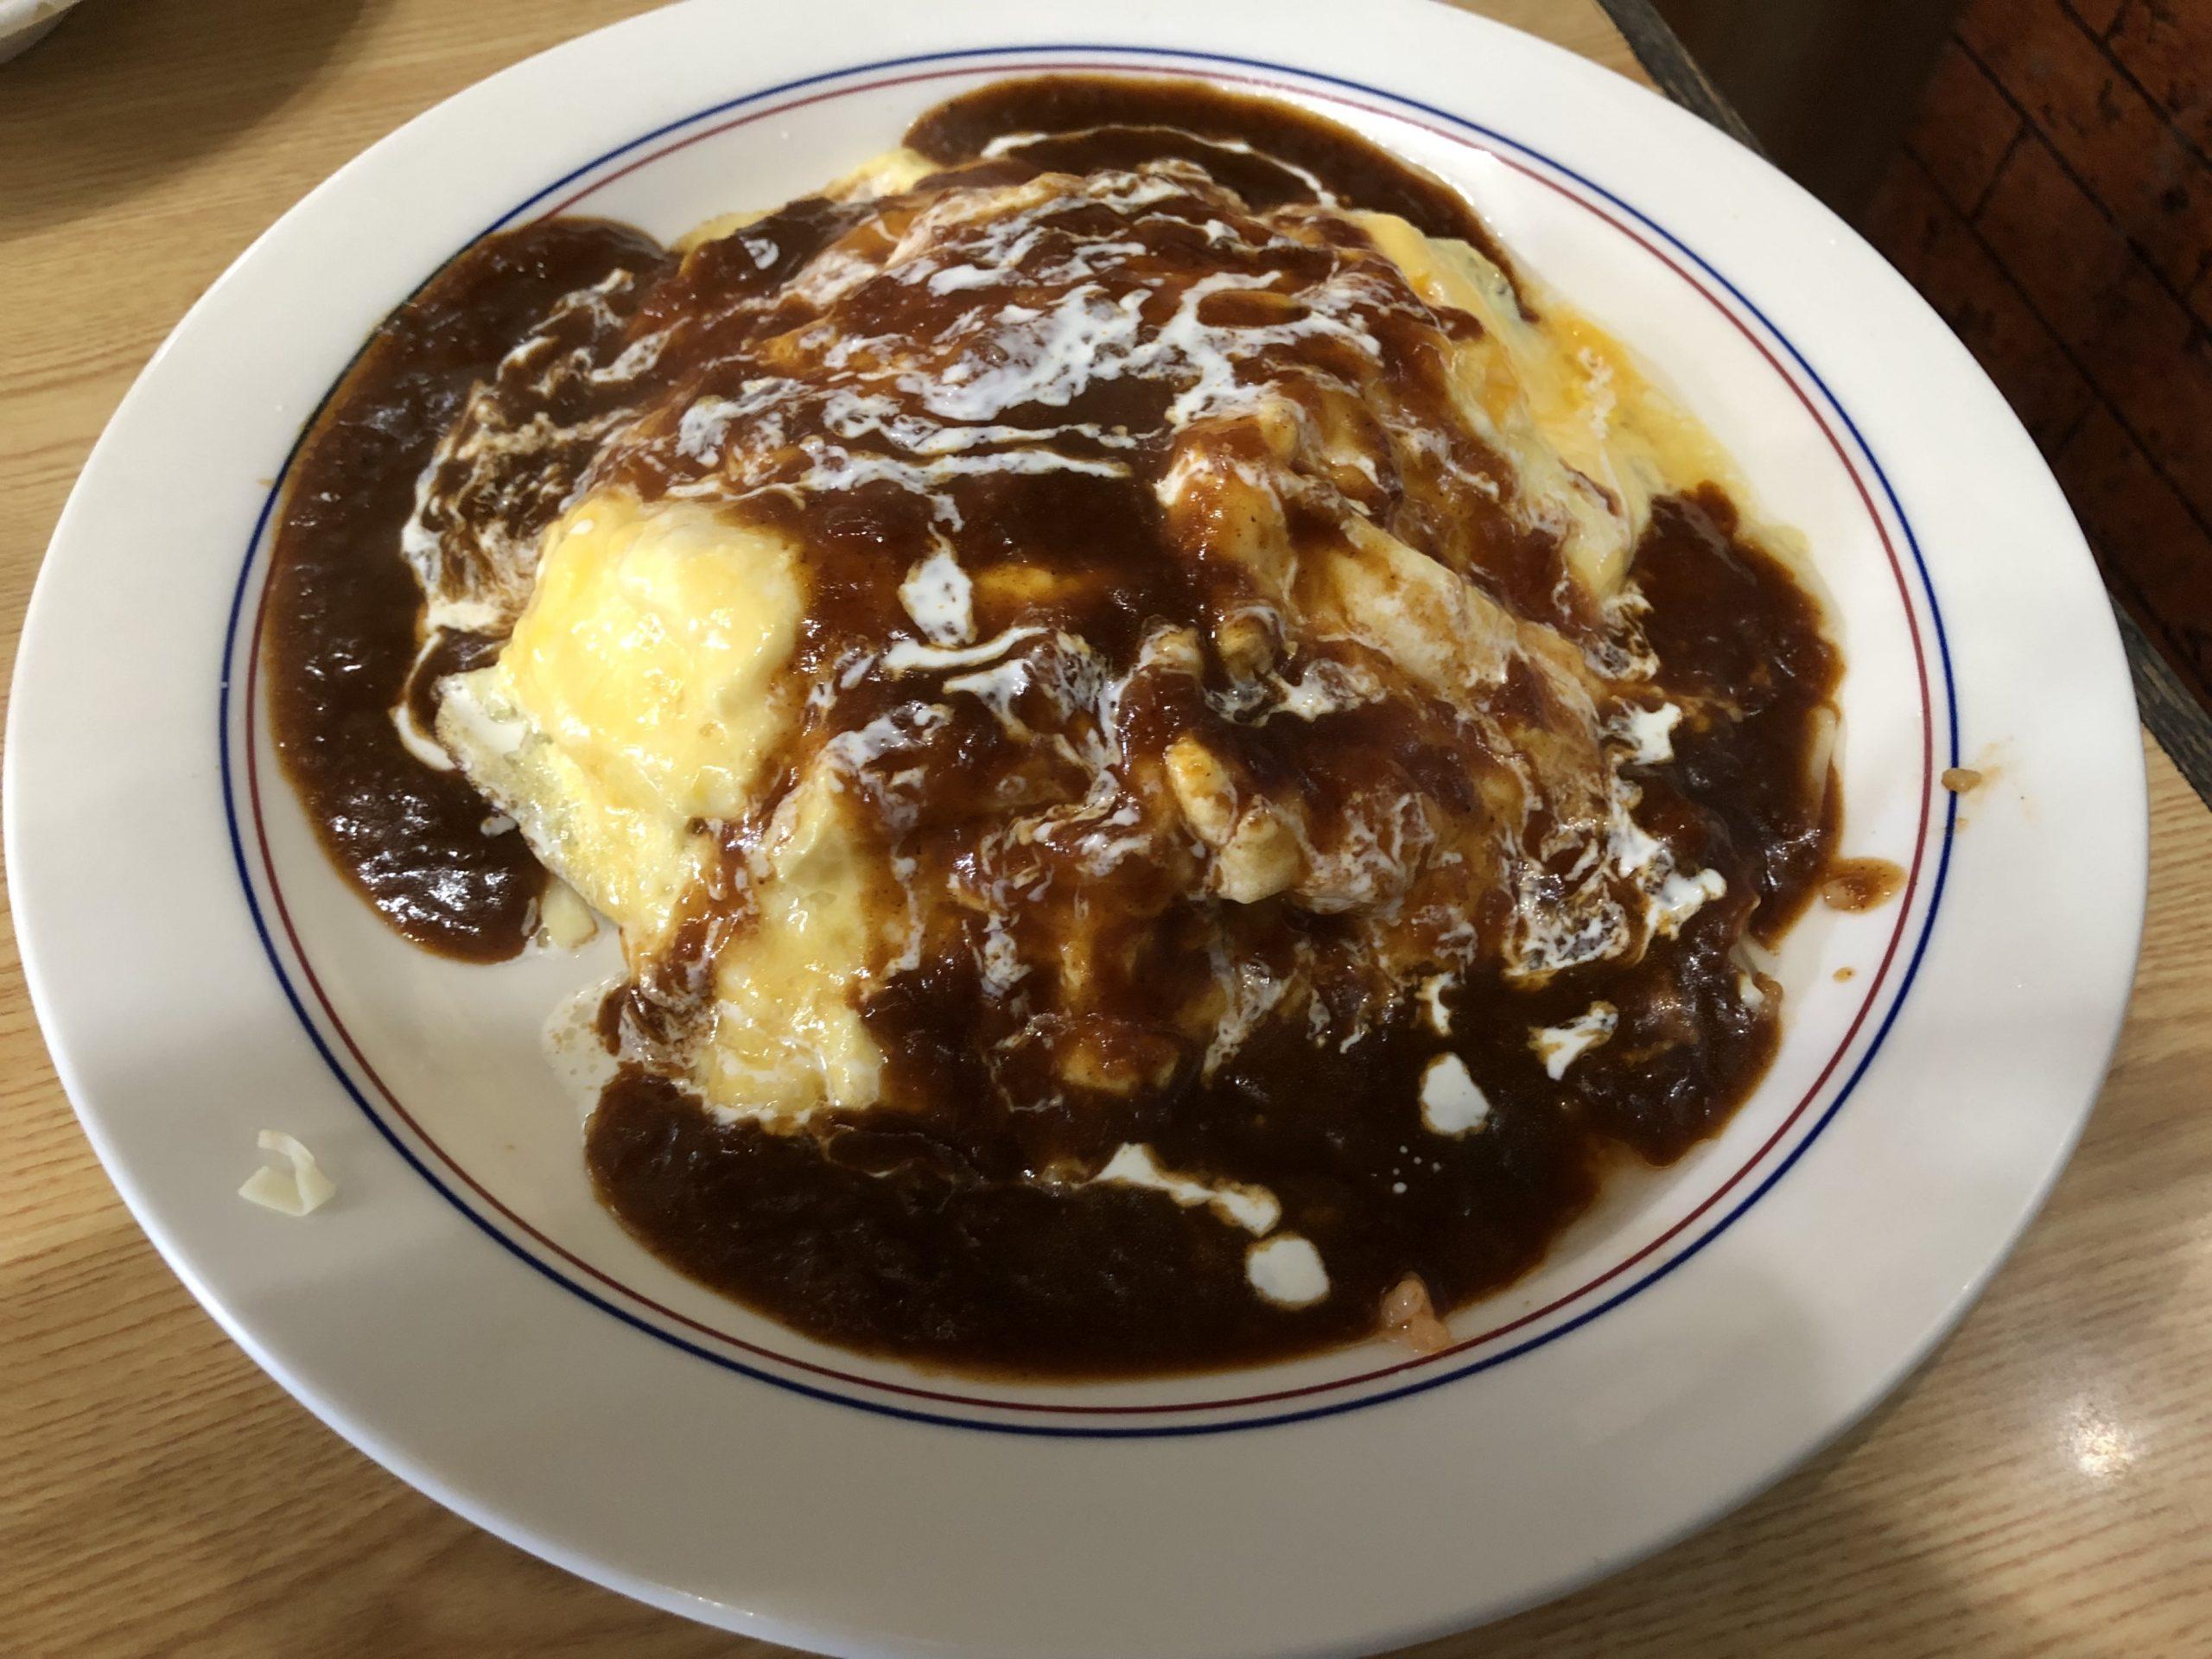 JR宇都宮駅東口近くで見つけた洋食屋さん「紙風船」に初訪問、ほんのりビターなデミグラスソースにチーズたっぷりな「いさおちゃんのオムライス」